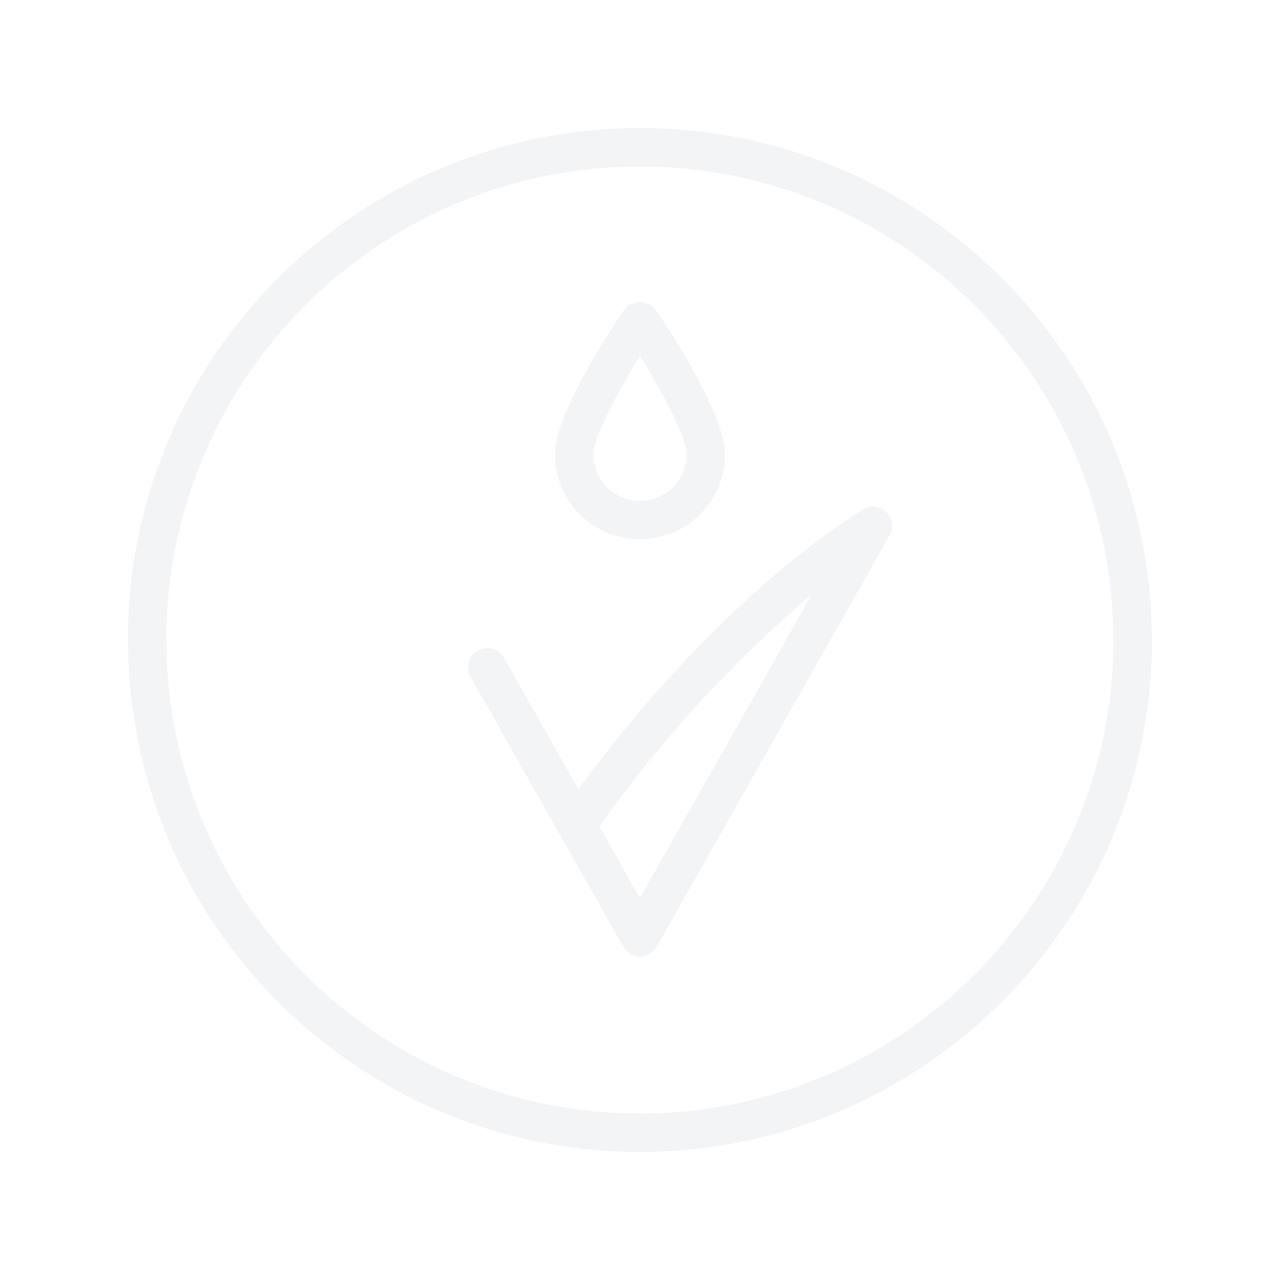 NATURA SIBERICA Oblepikha Hand Cream крем для рук 30ml